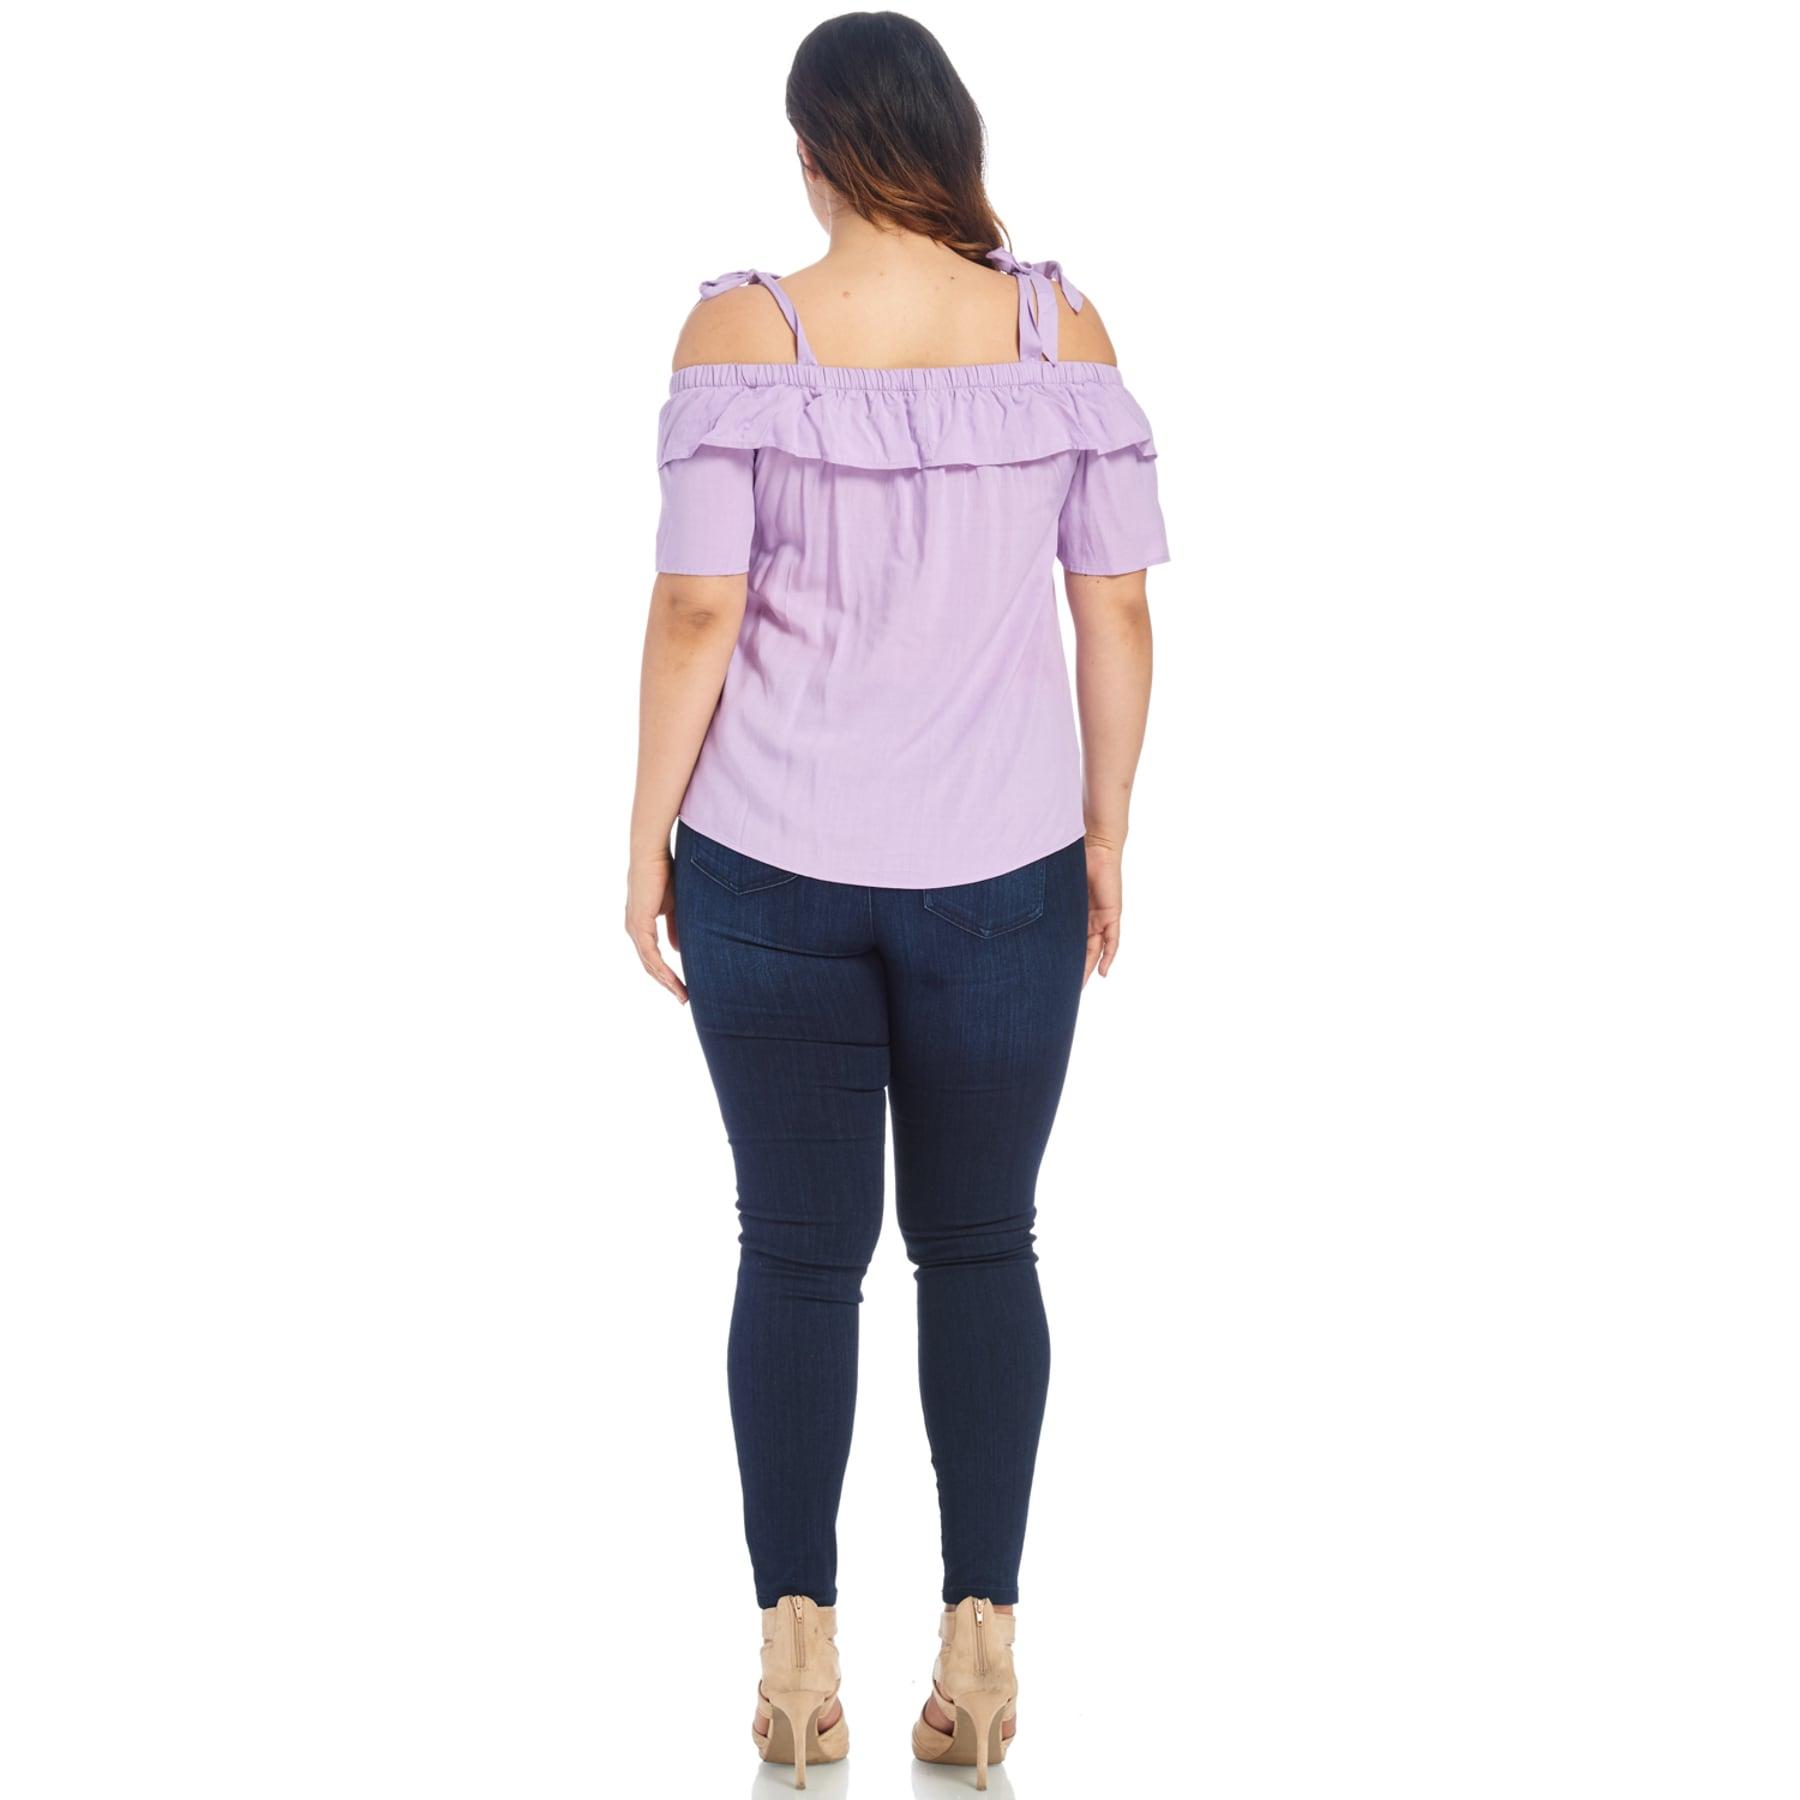 7e1e7e7a7cf Shop Xehar Women s Plus Size Sexy Elastic Shoulder Tie Blouse Top - Free  Shipping On Orders Over  45 - Overstock.com - 15060504